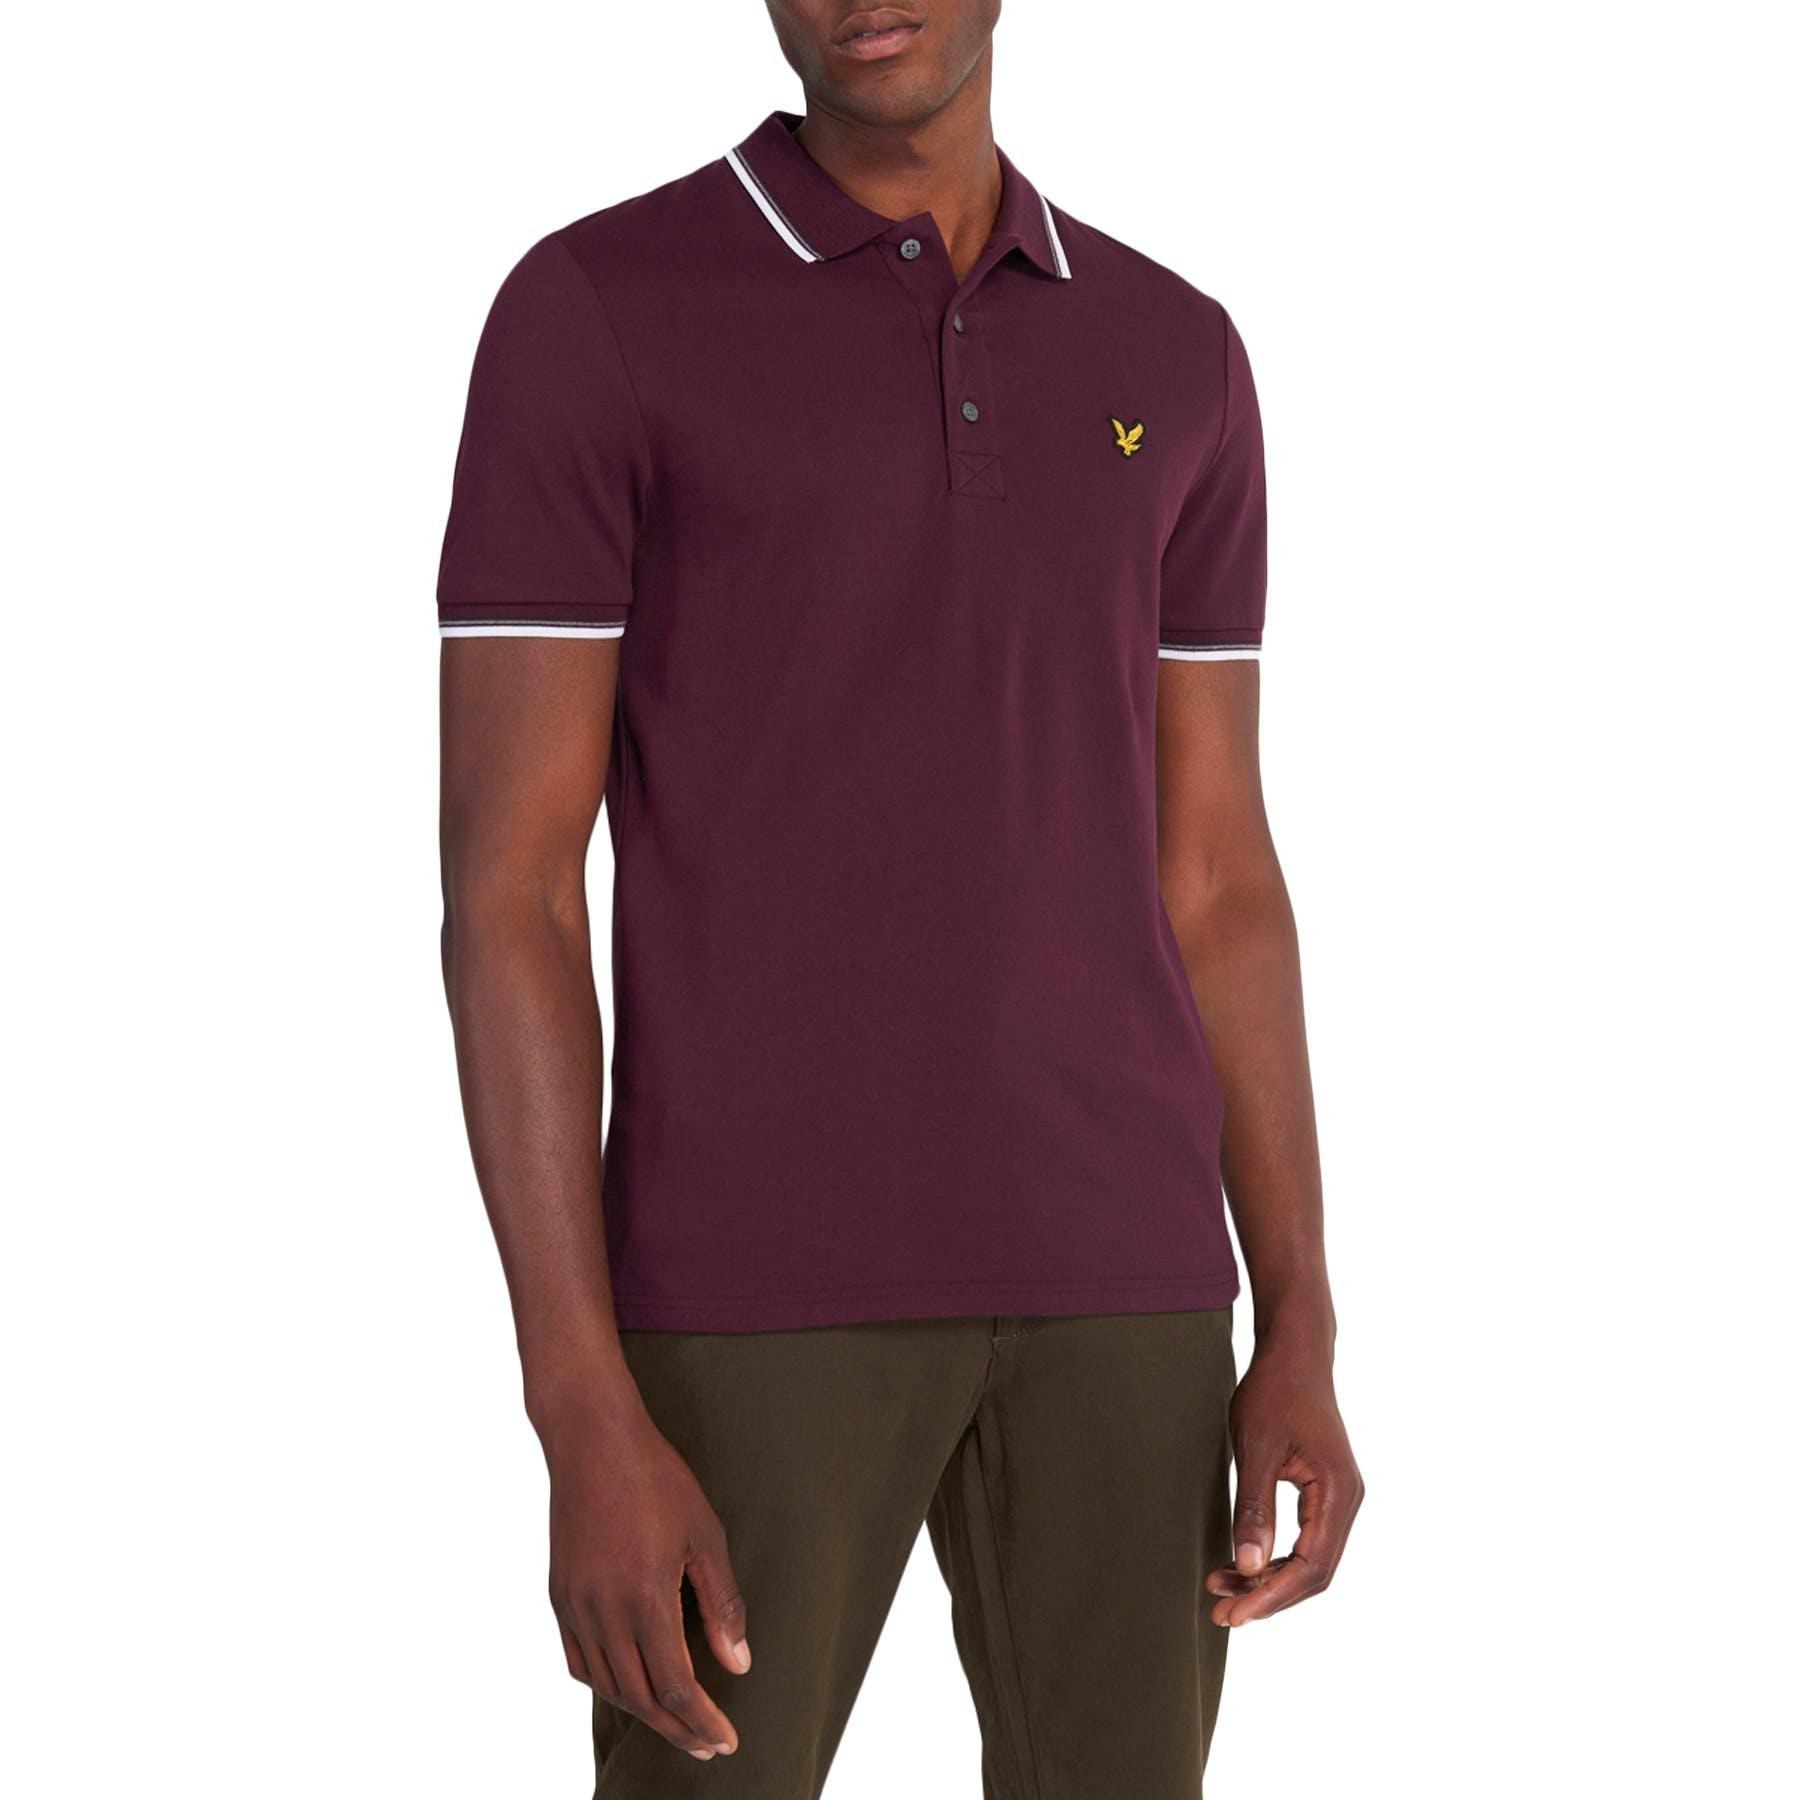 LYLE /& SCOTT  Short Sleeve Tipped Polo Shirt for Men/'s